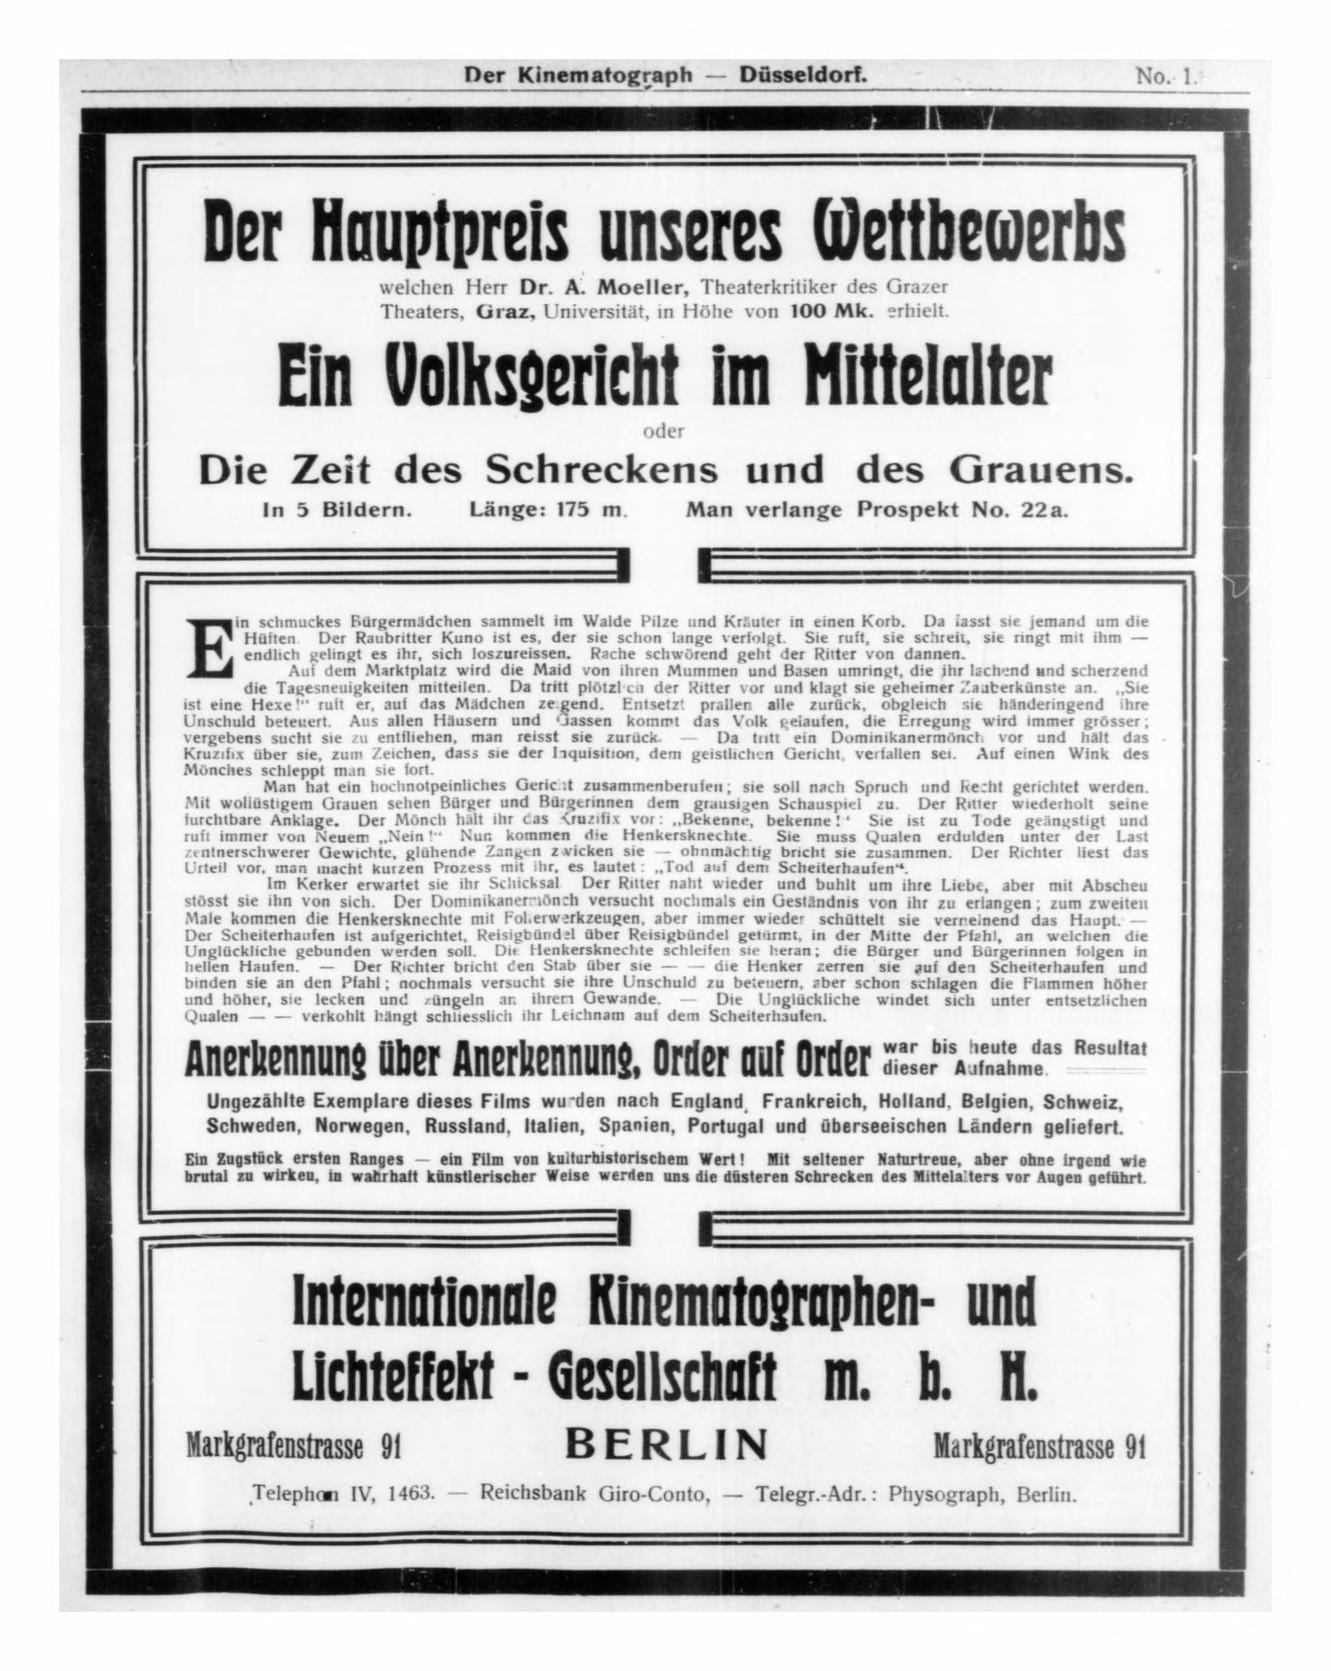 Kinematograph01-1907-01_jp2.zip&file=kinematograph01-1907-01_jp2%2fkinematograph01-1907-01_0002